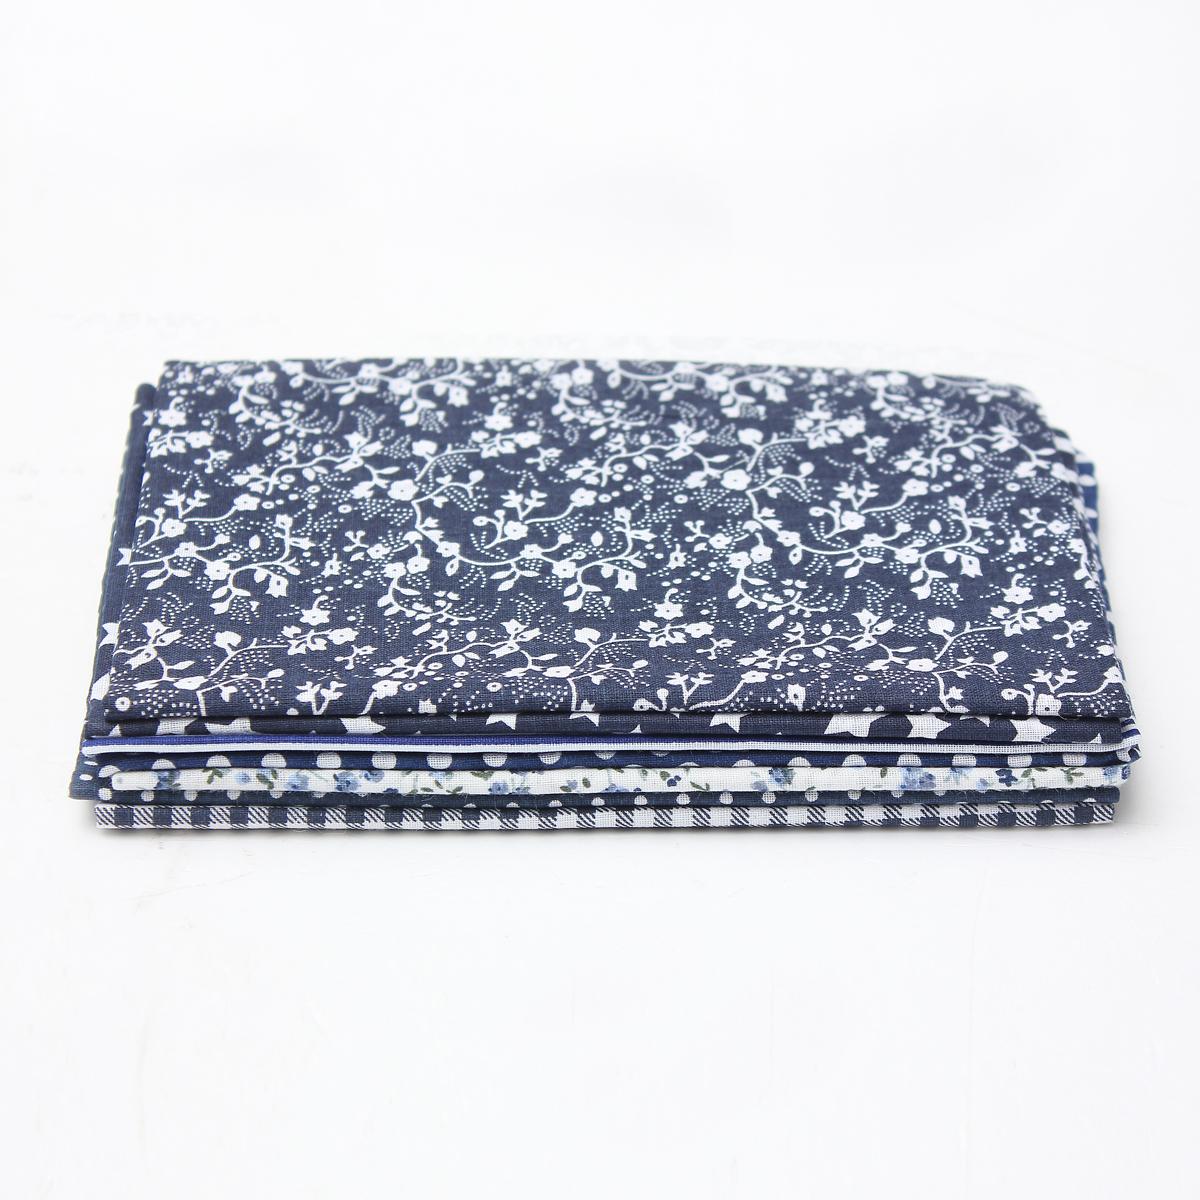 KINGSO 7PCS Cotton Fabric Included